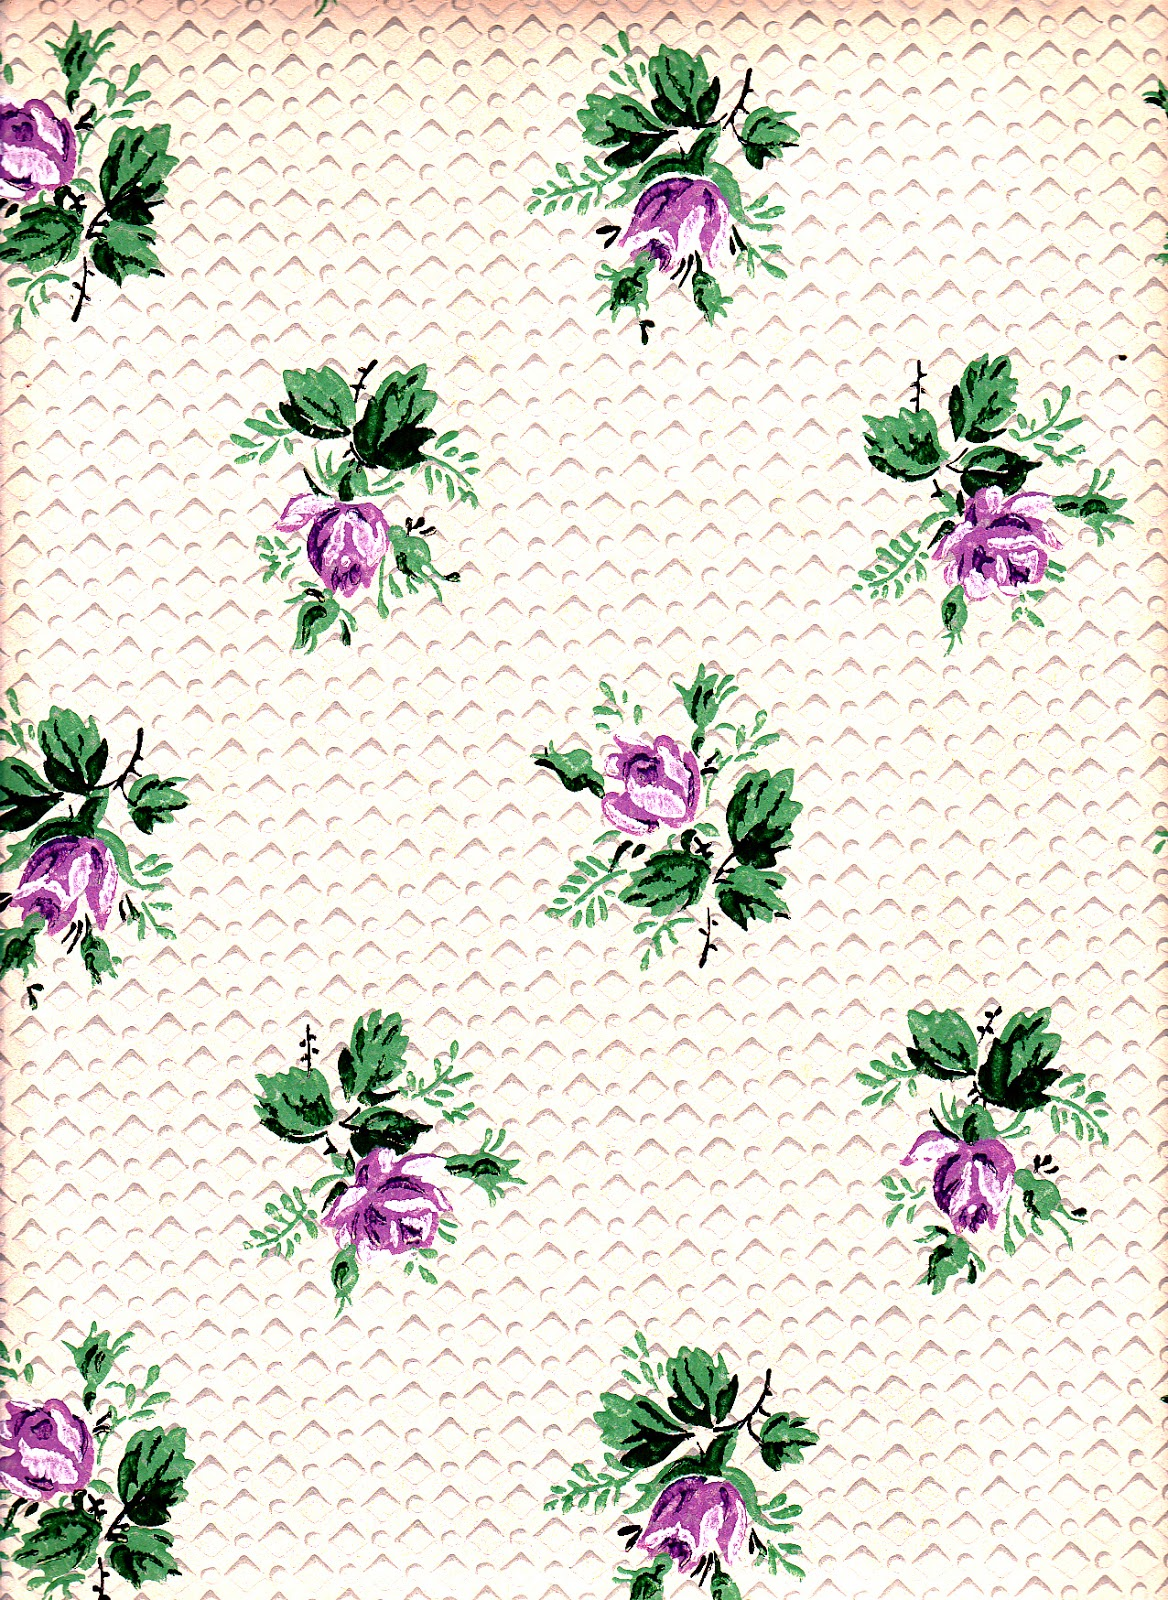 Madeline's Memories: More Vintage Wallpaper Samples